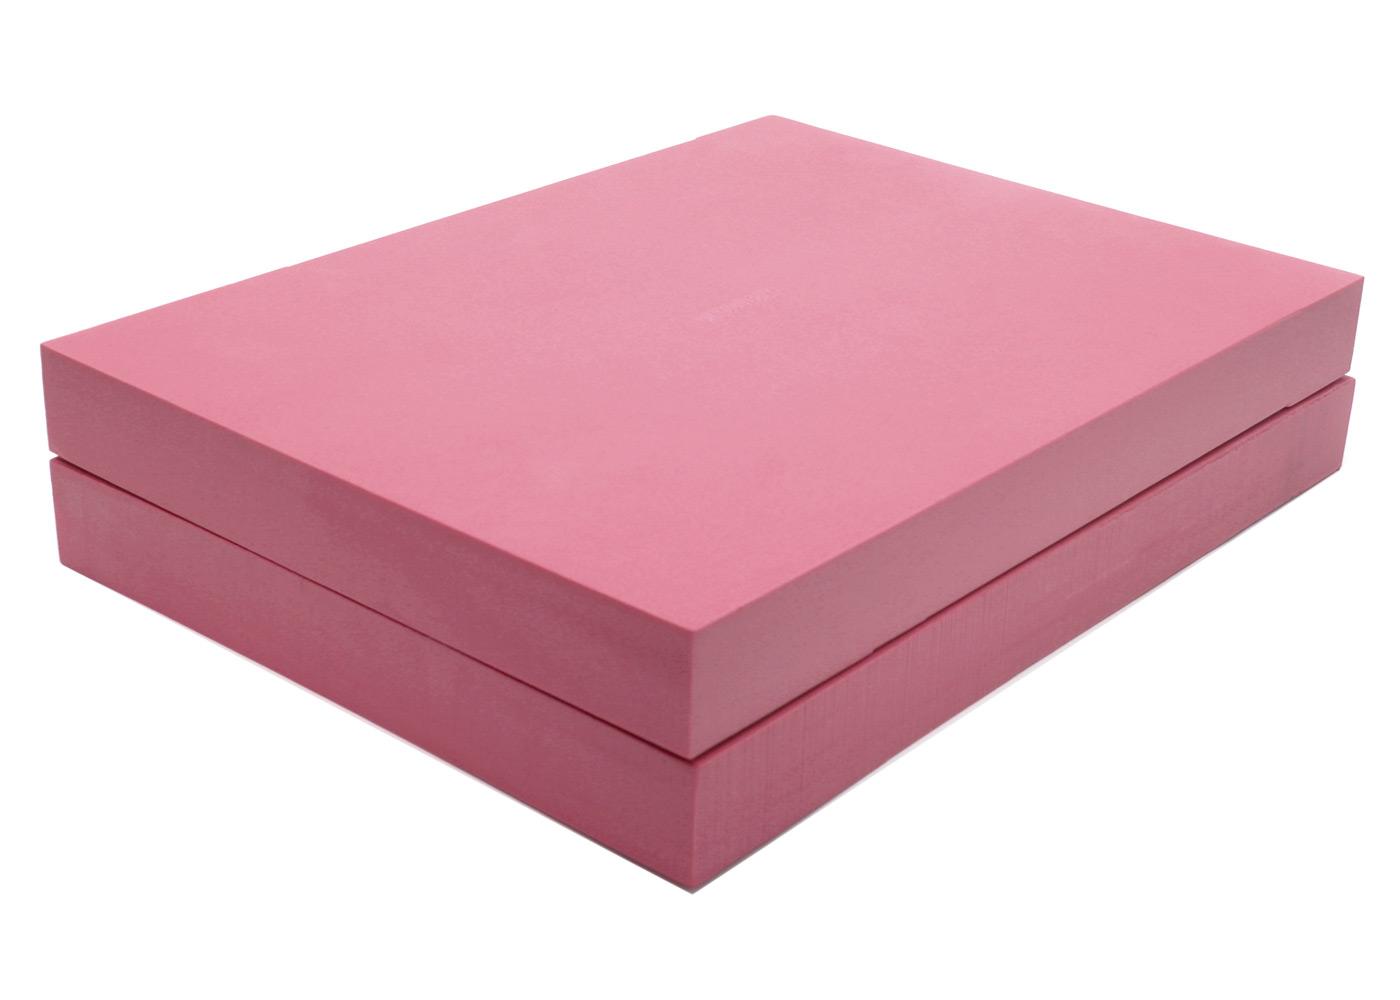 yoga block 39 shoulderstand 39 buy online at yogistar com yoga equipment yoga mats and yoga. Black Bedroom Furniture Sets. Home Design Ideas